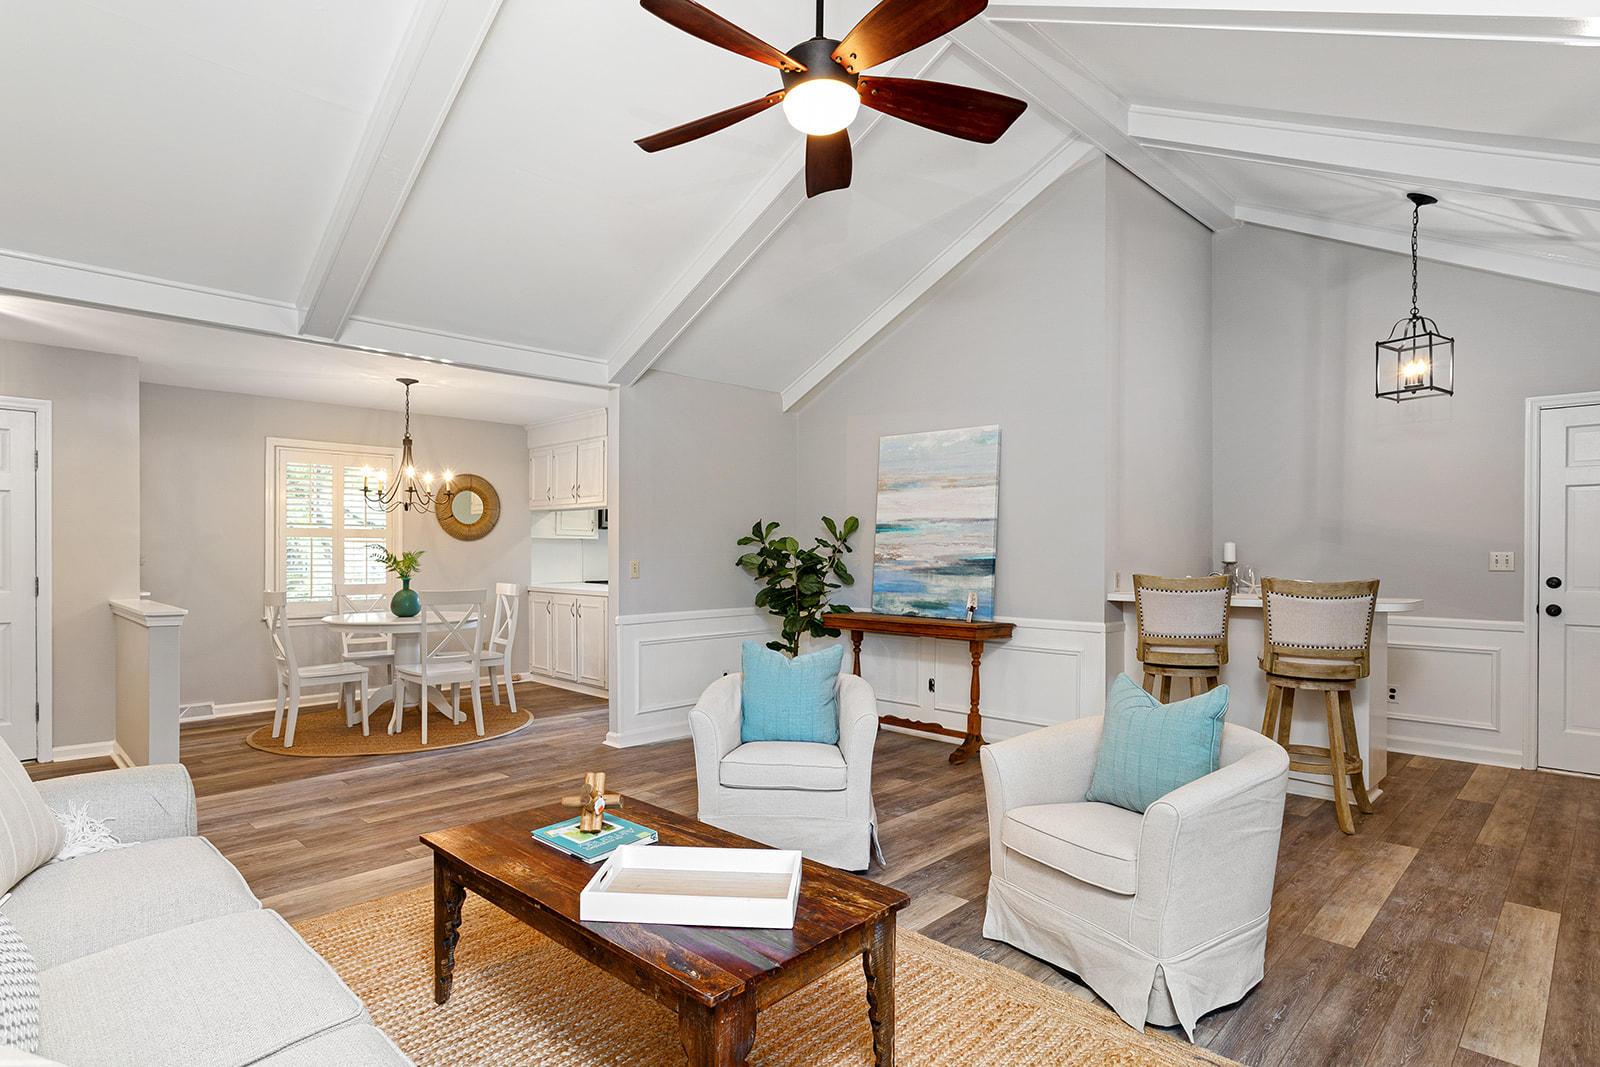 Shemwood II Homes For Sale - 954 Sea Gull, Mount Pleasant, SC - 1